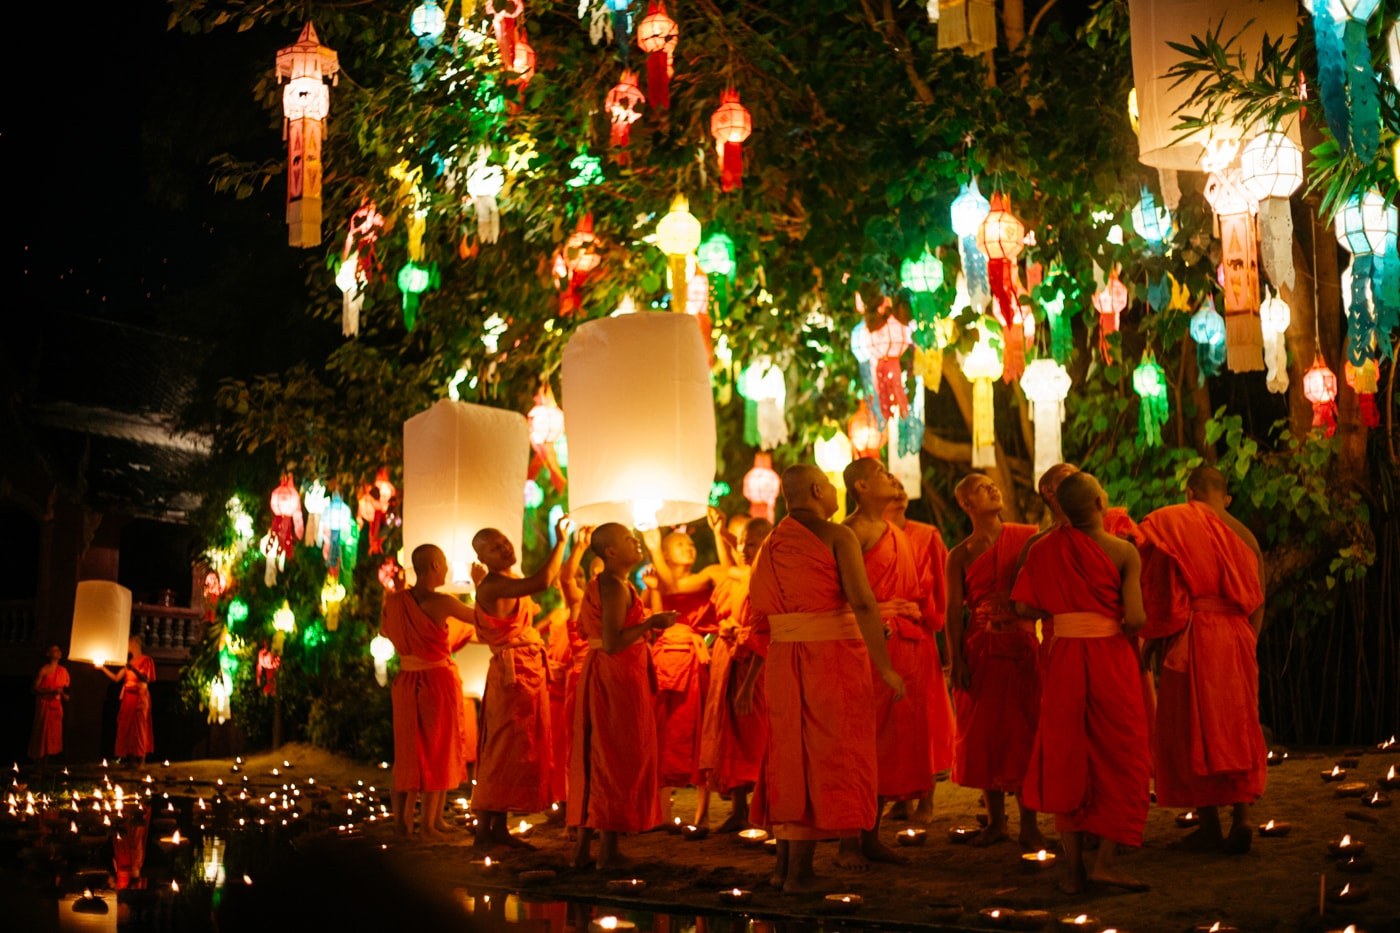 RAW 112-EMIDI- Loi Krathong- Wat Phan Tao, Chiang Mai, Thailand (1)